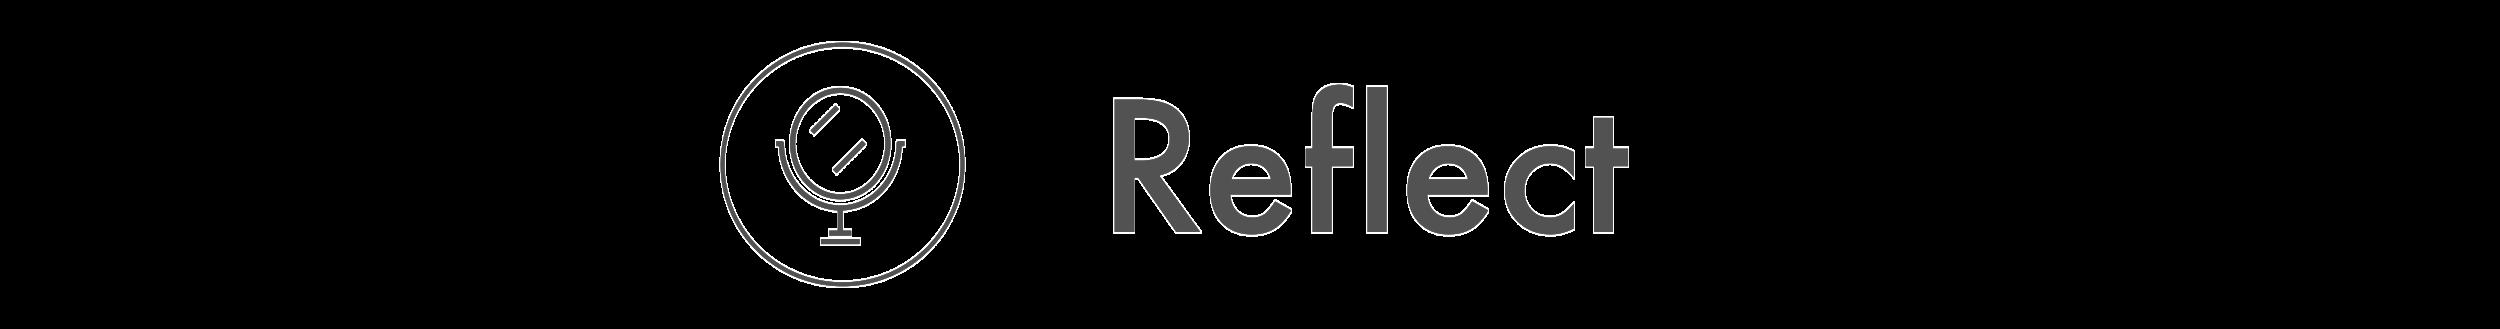 reflect-38.png